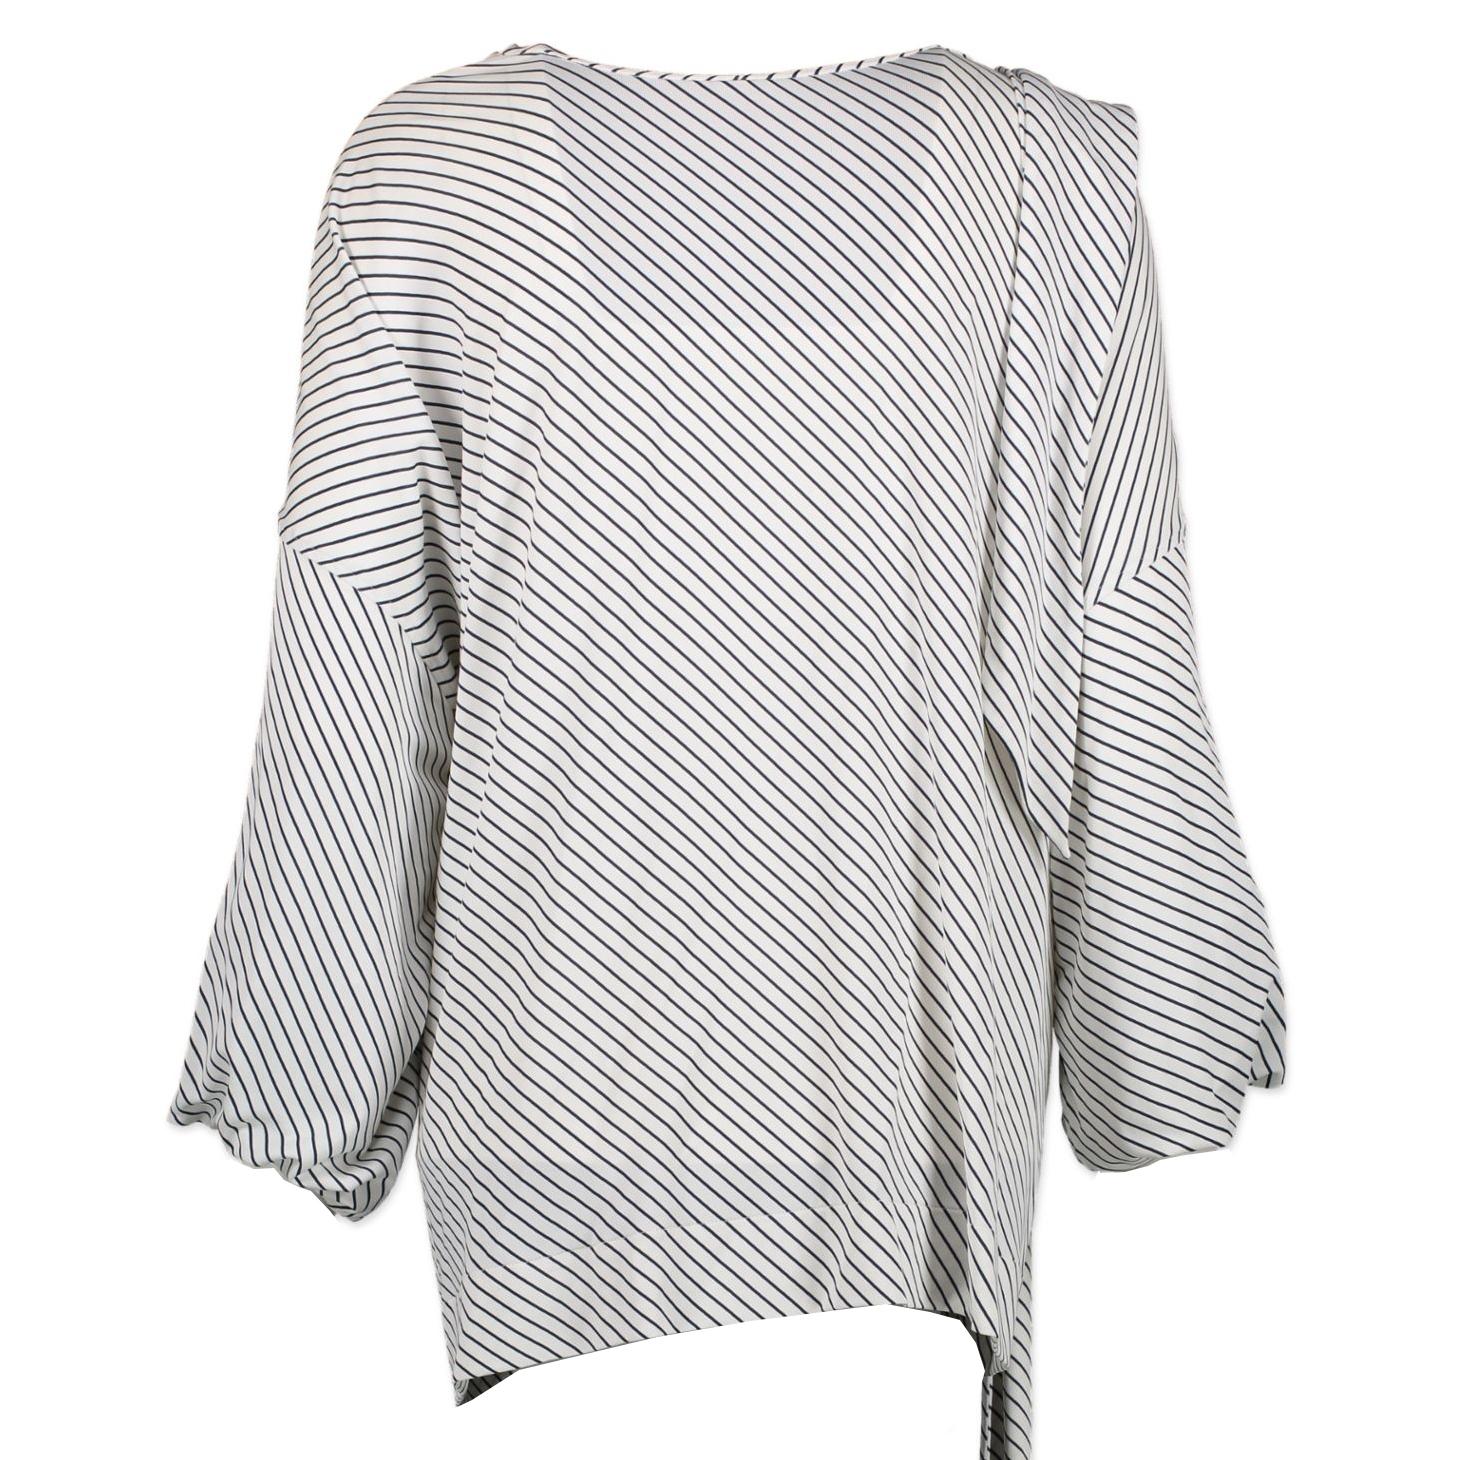 Balenciaga White Blue Striped Blouse - Size 34